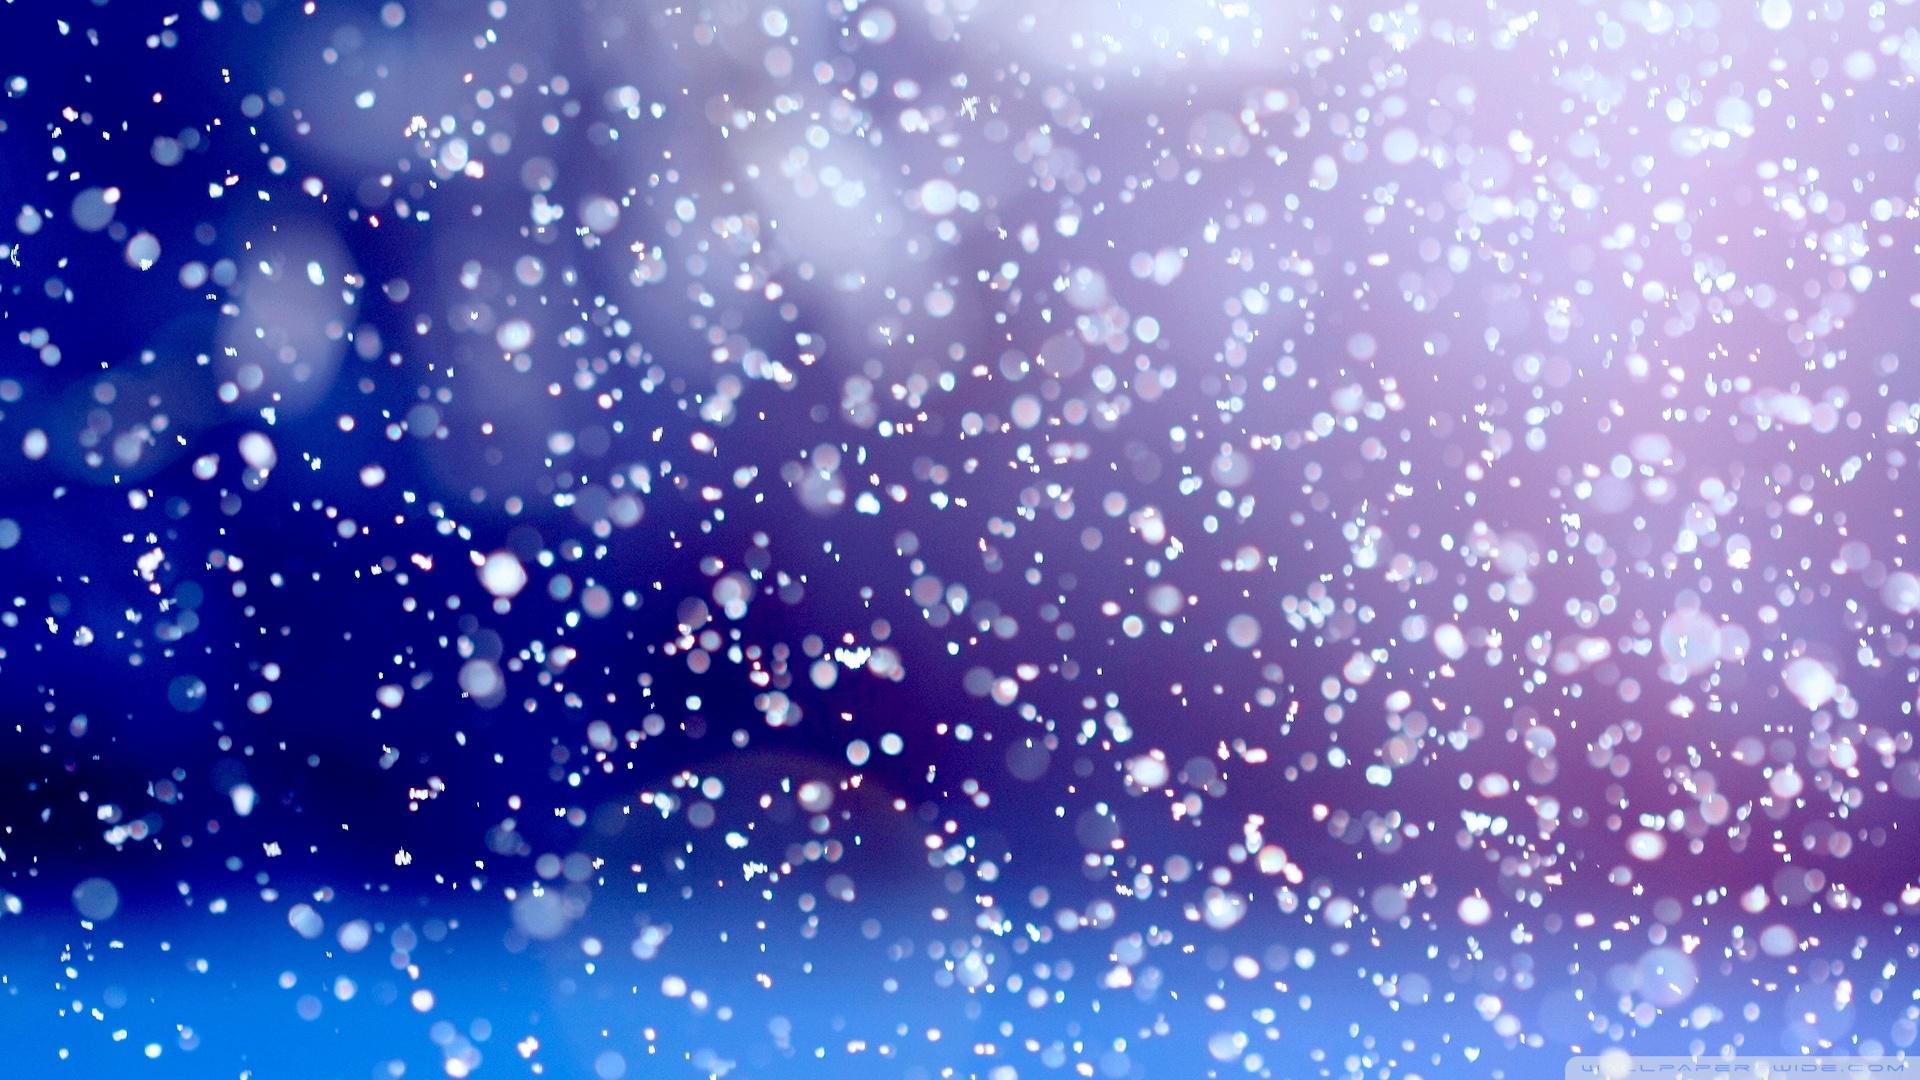 Real Snowflake Wallpaper Photo For Free Wallpaper High Resolution Snow Background 1920x1080 Wallpaper Teahub Io